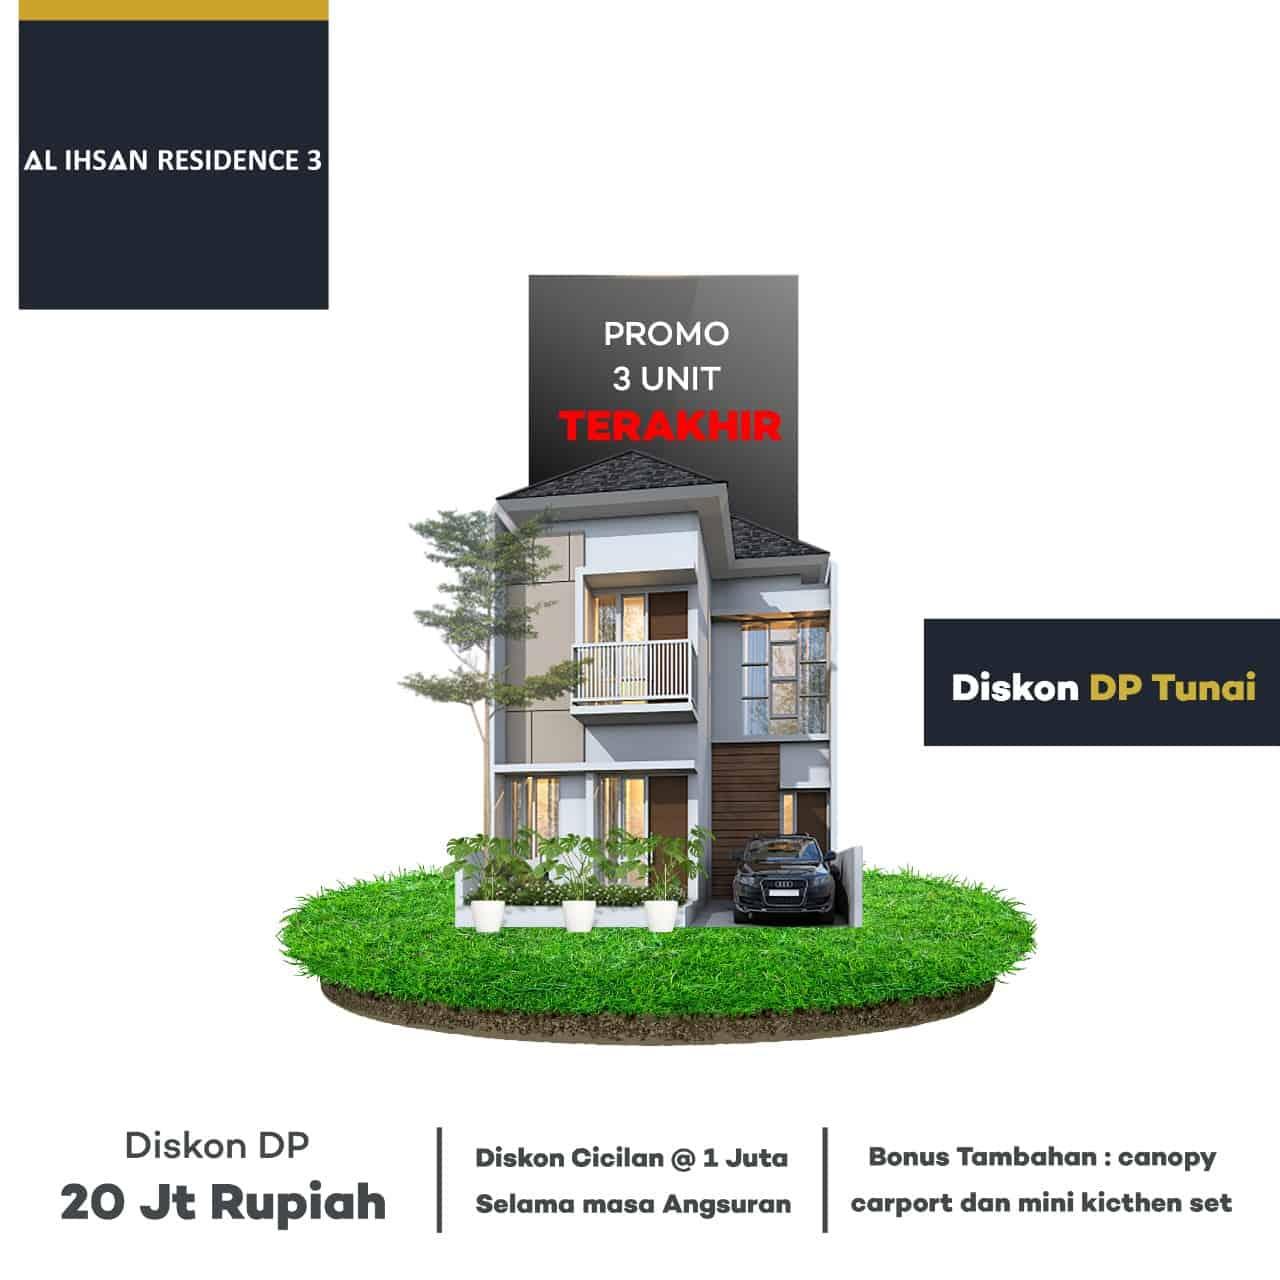 perumahan syariah cinangka - background atas perumahan syariah depok pondok cabe al - ihsan residence 3 - promo september - davpropertysyariah